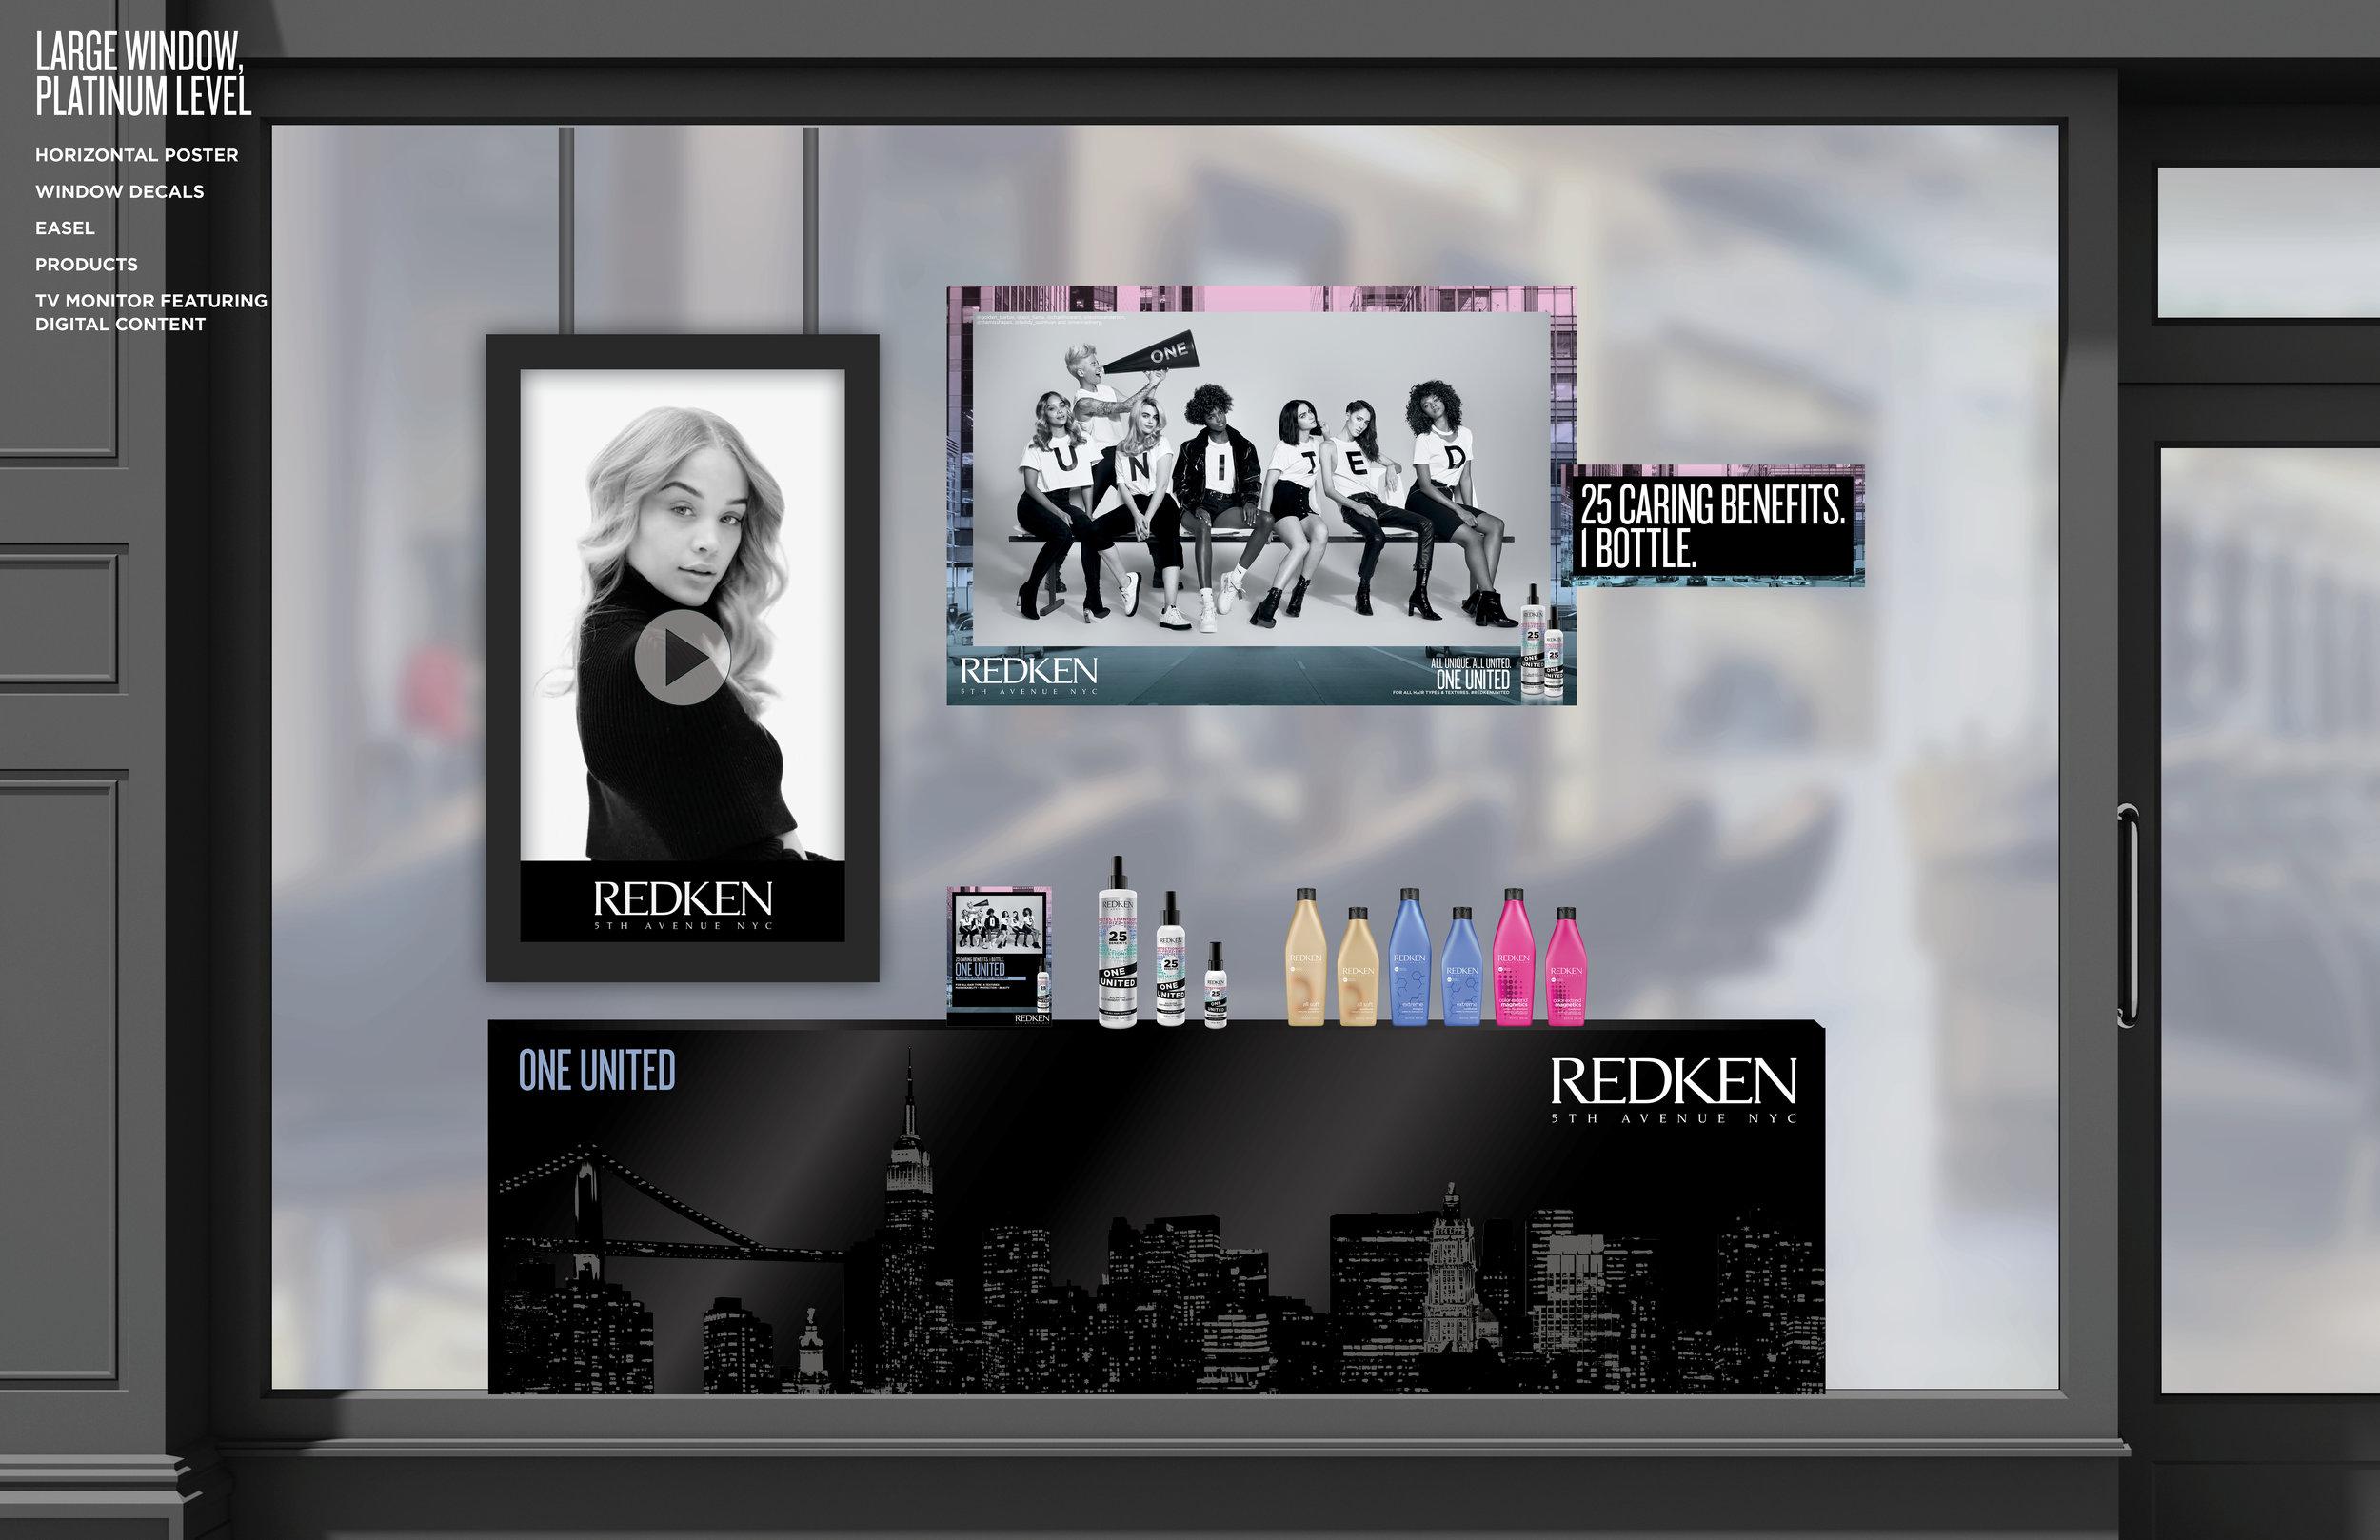 Redken-GL-2018-One-United-Premium-Window.jpg